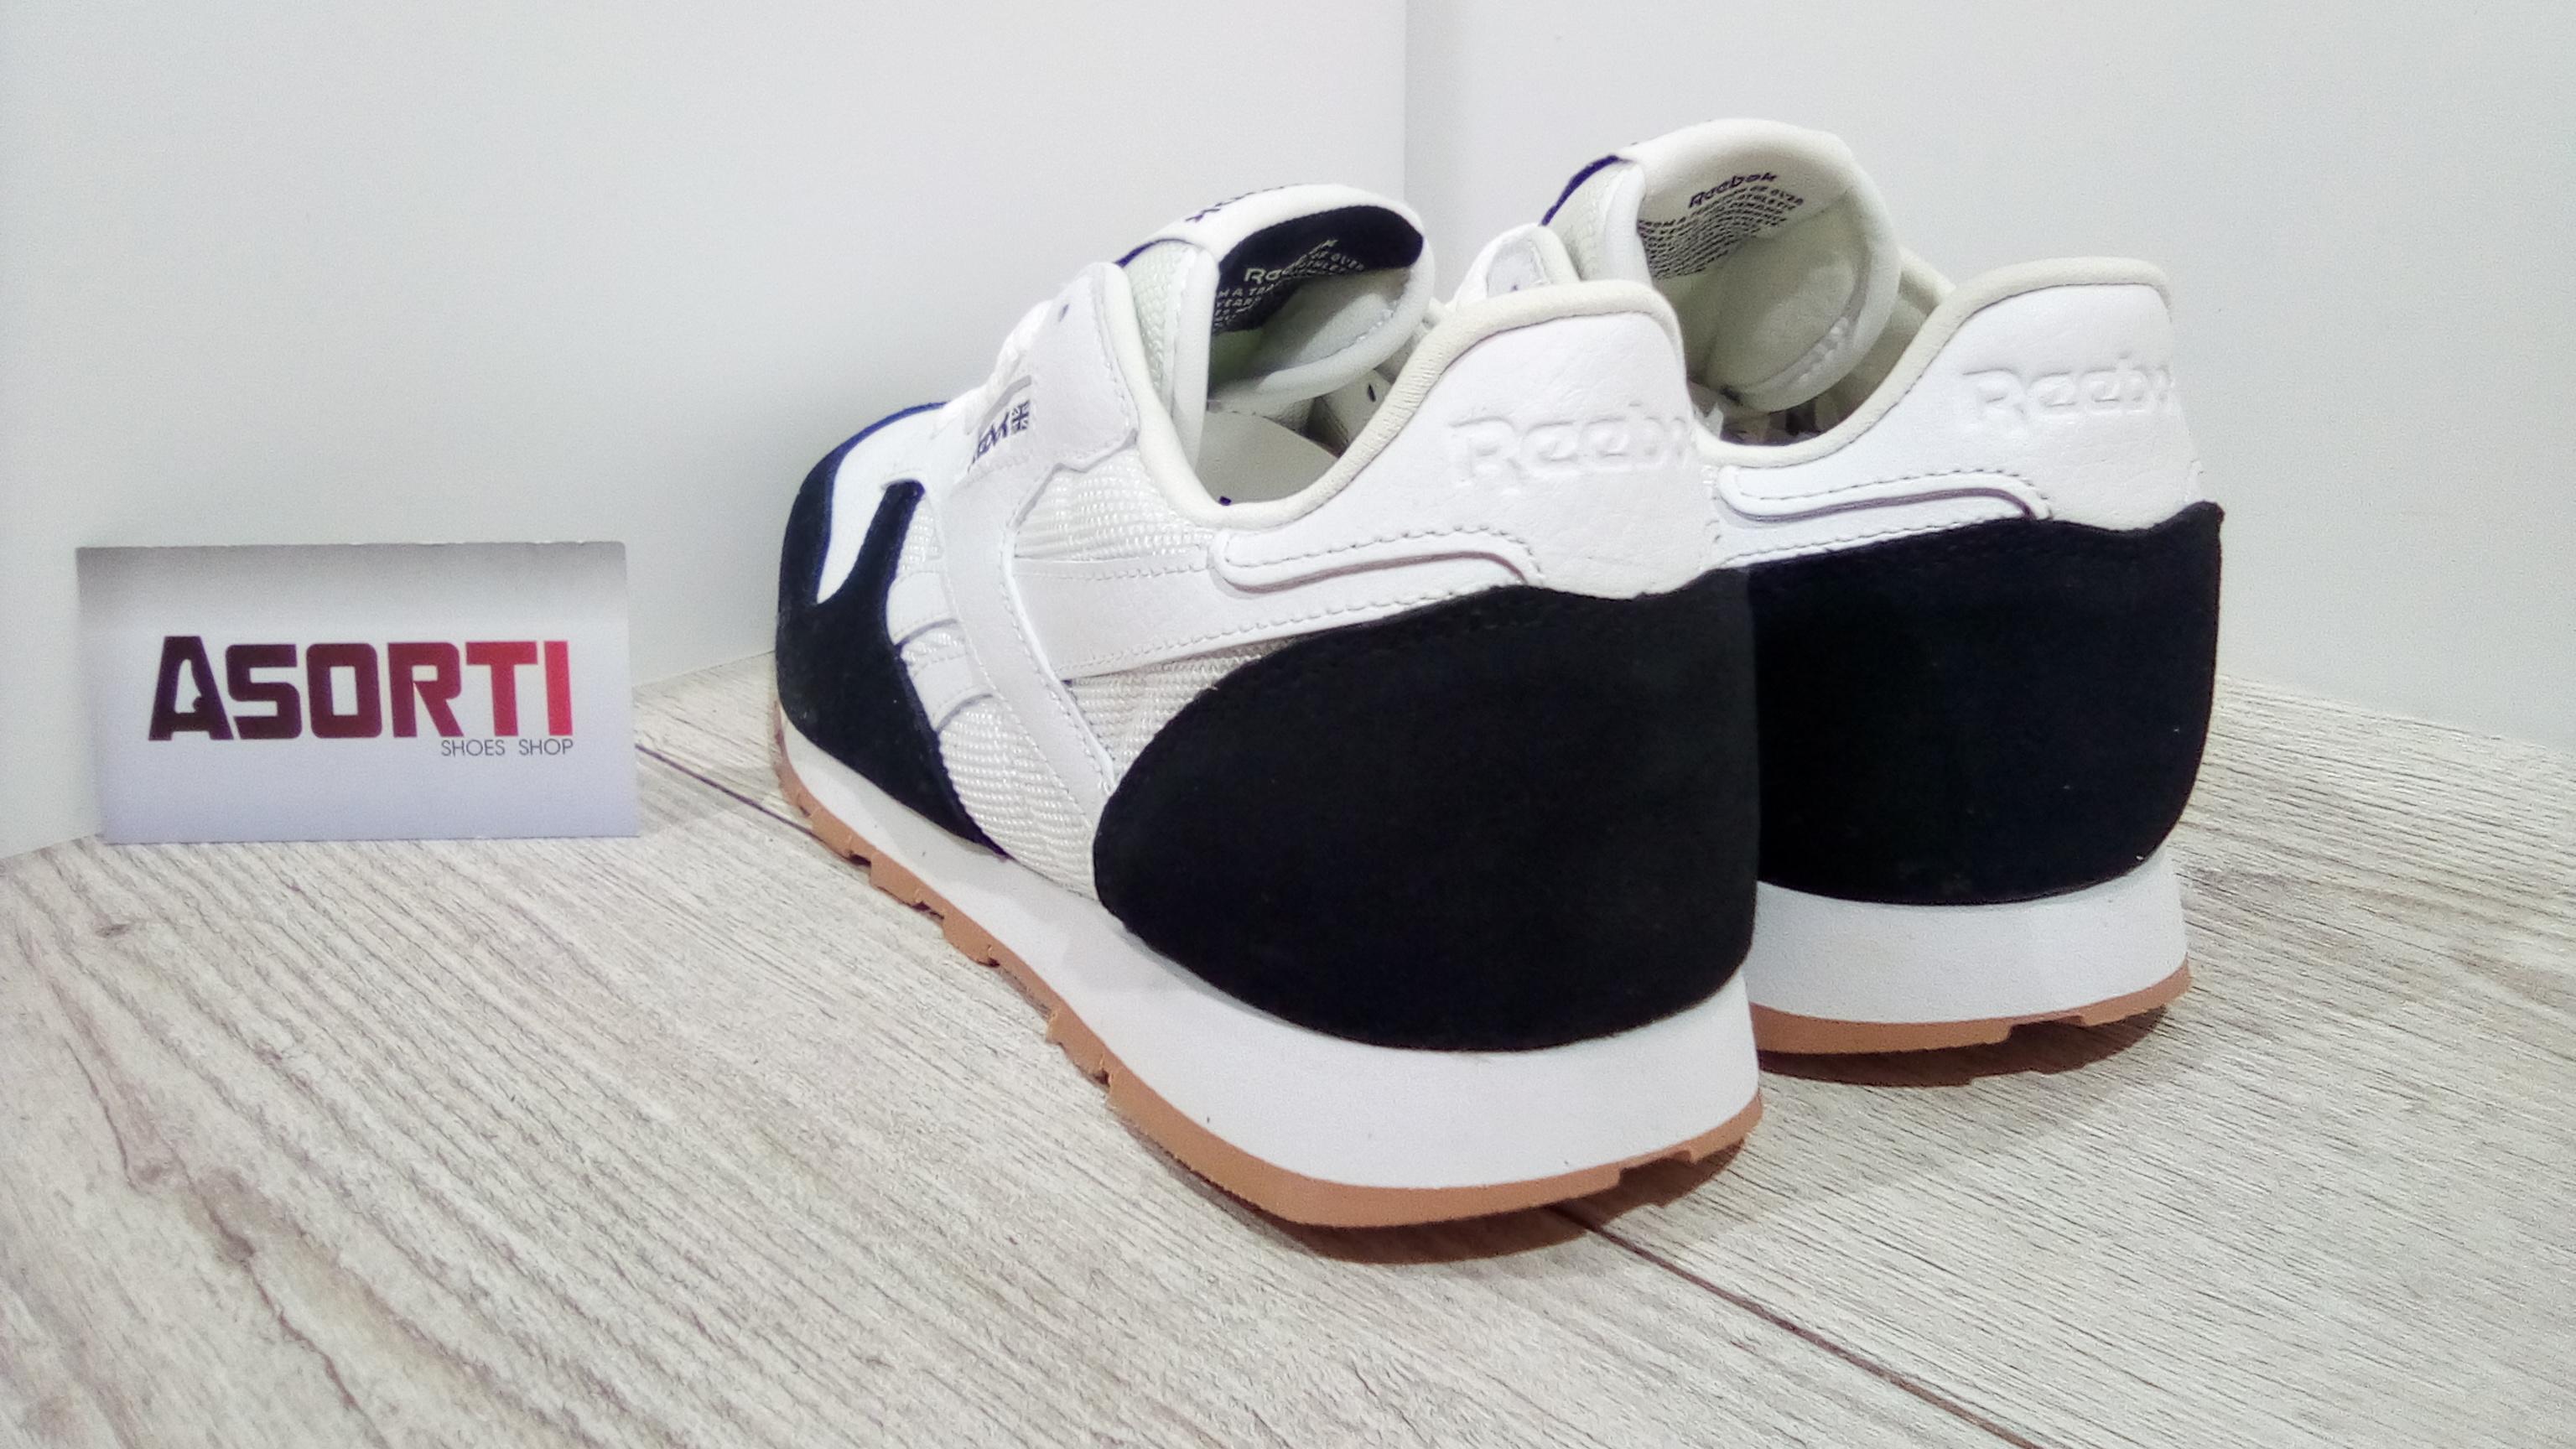 4776d8f91b680c Женские кроссовки Reebok Classic Leather Perfect Split бело-черные ...